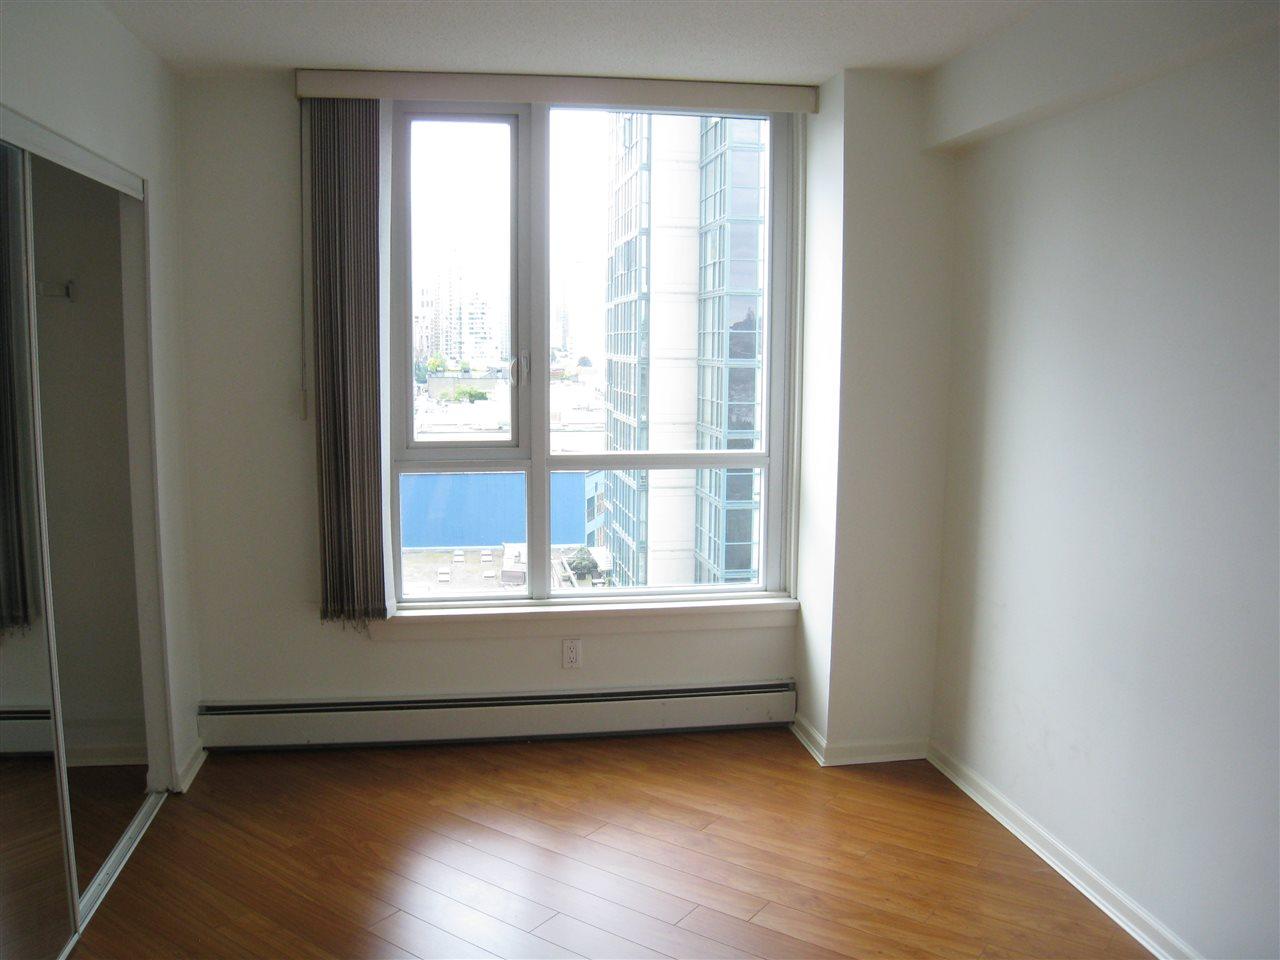 Condo Apartment at 1305 388 DRAKE STREET, Unit 1305, Vancouver West, British Columbia. Image 10